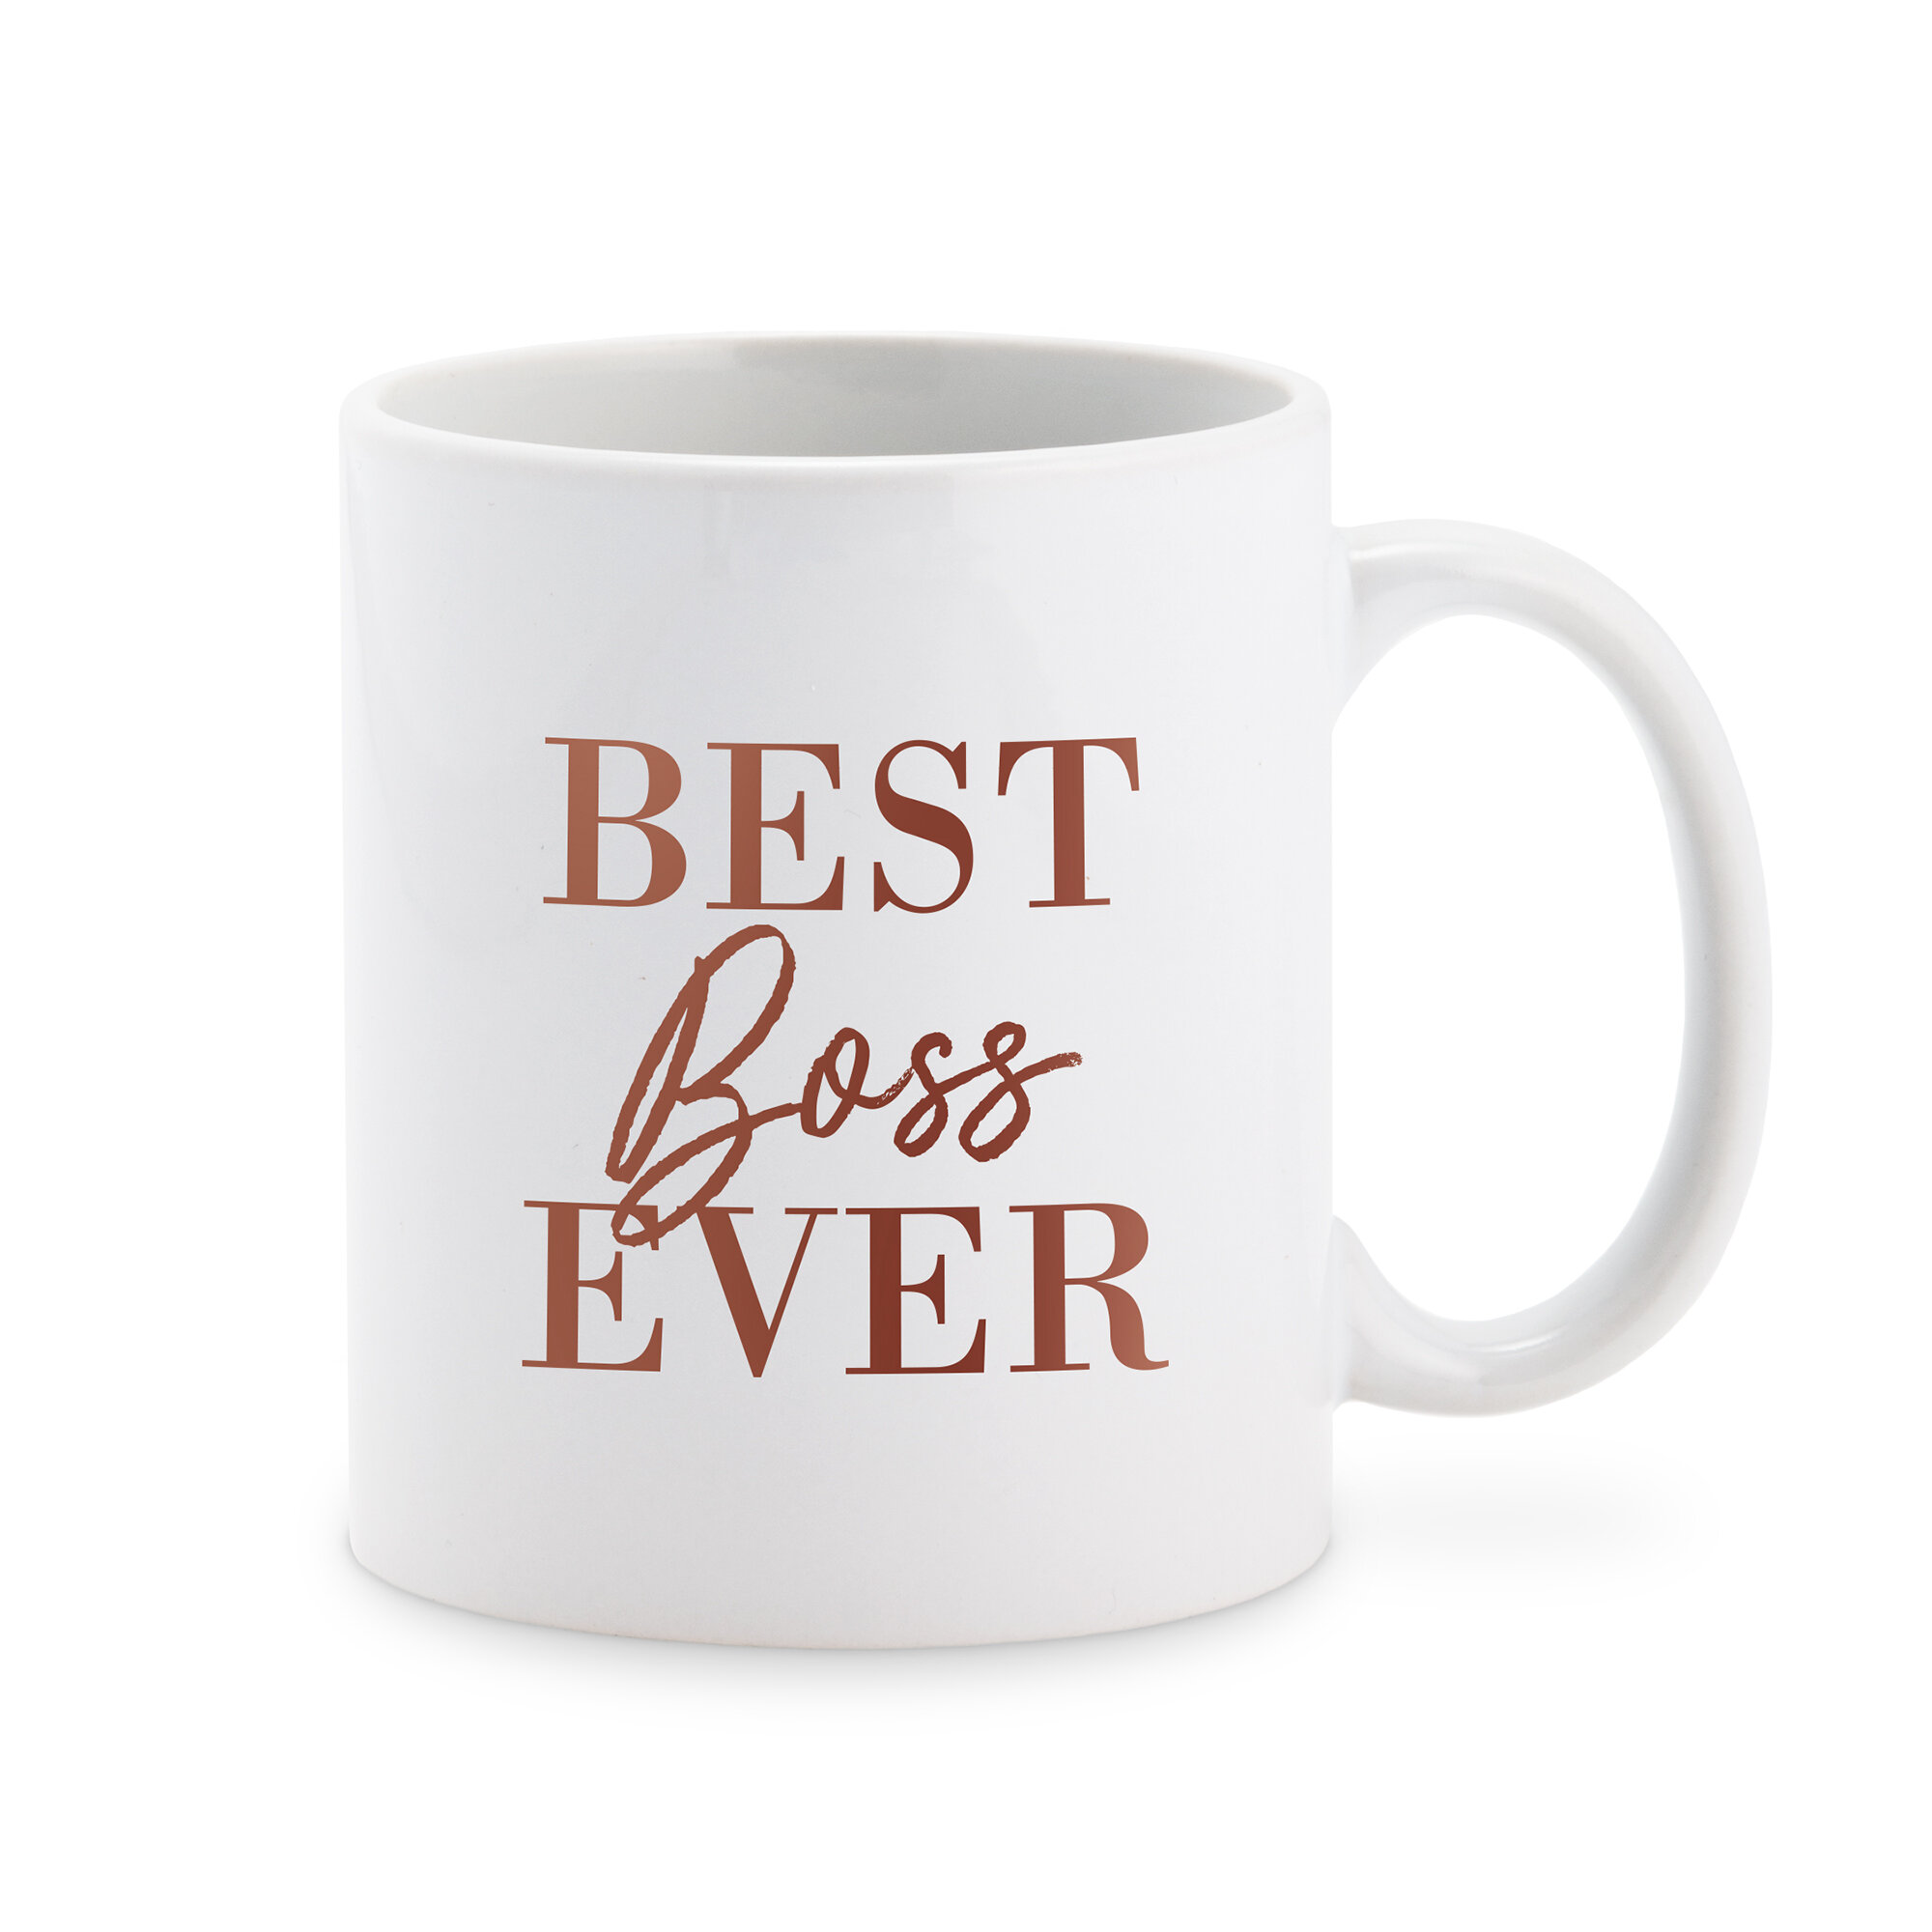 Personalised The Real Boss Coffee Mug